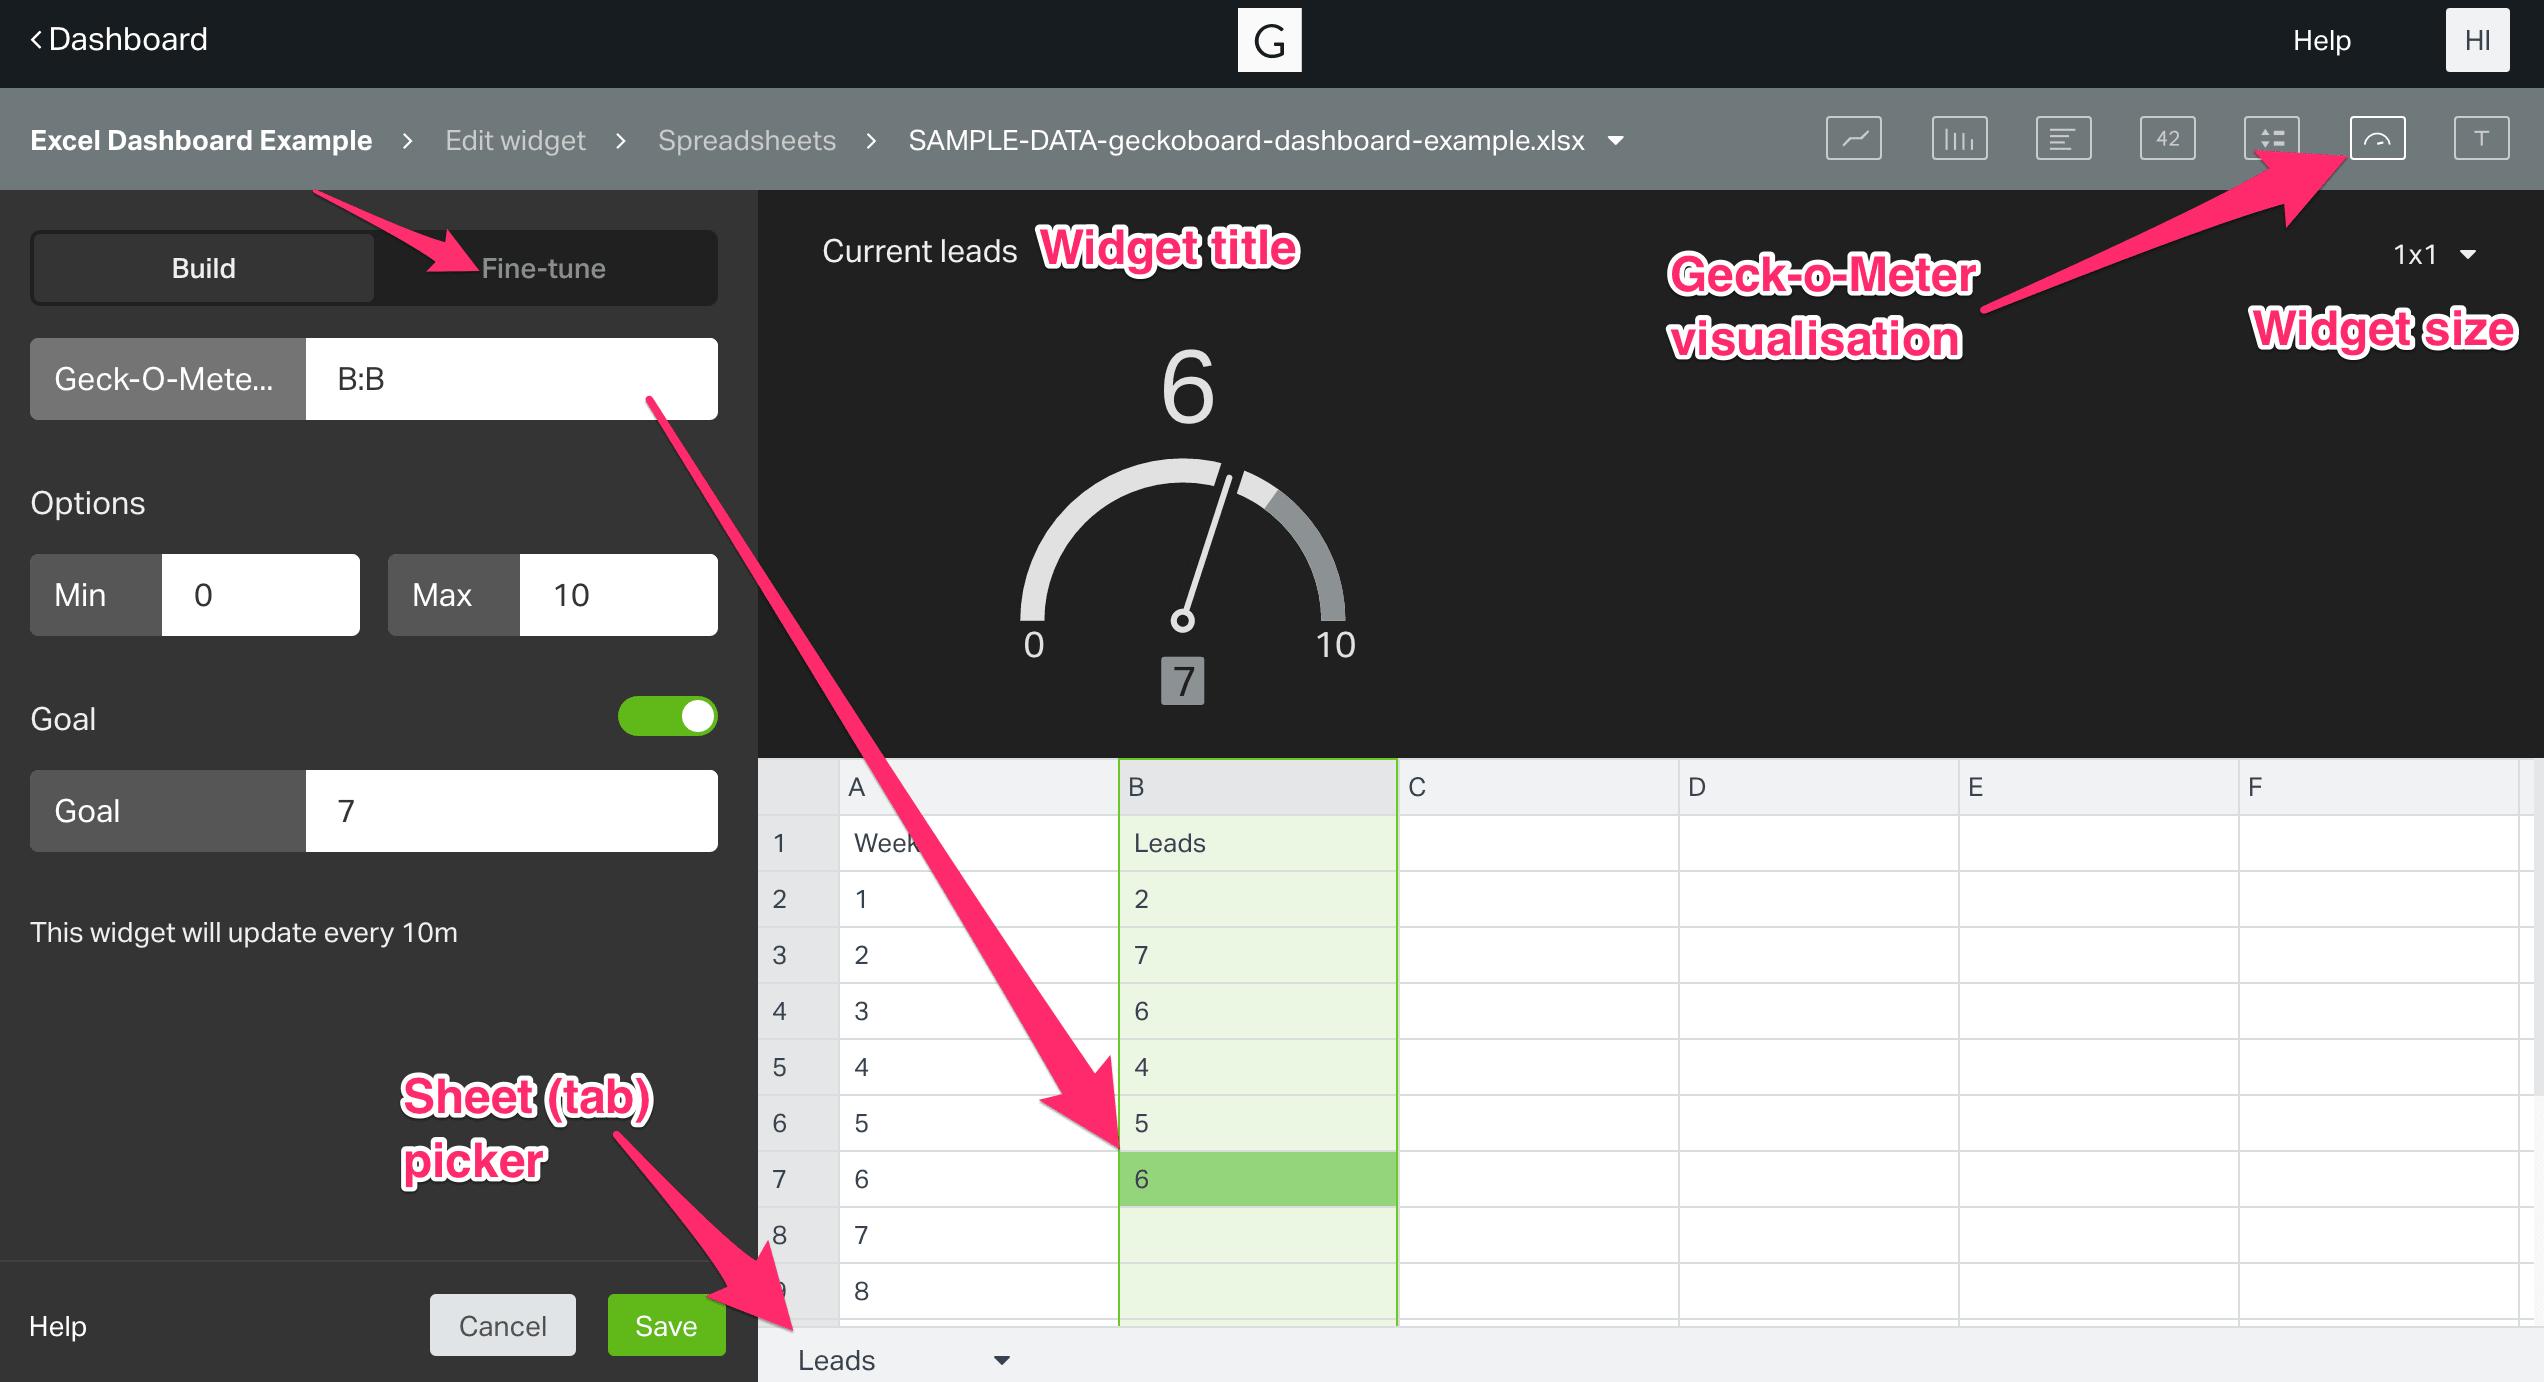 widget set up for Geckoboard Geck-o-Meter widget using Excel spreadsheets